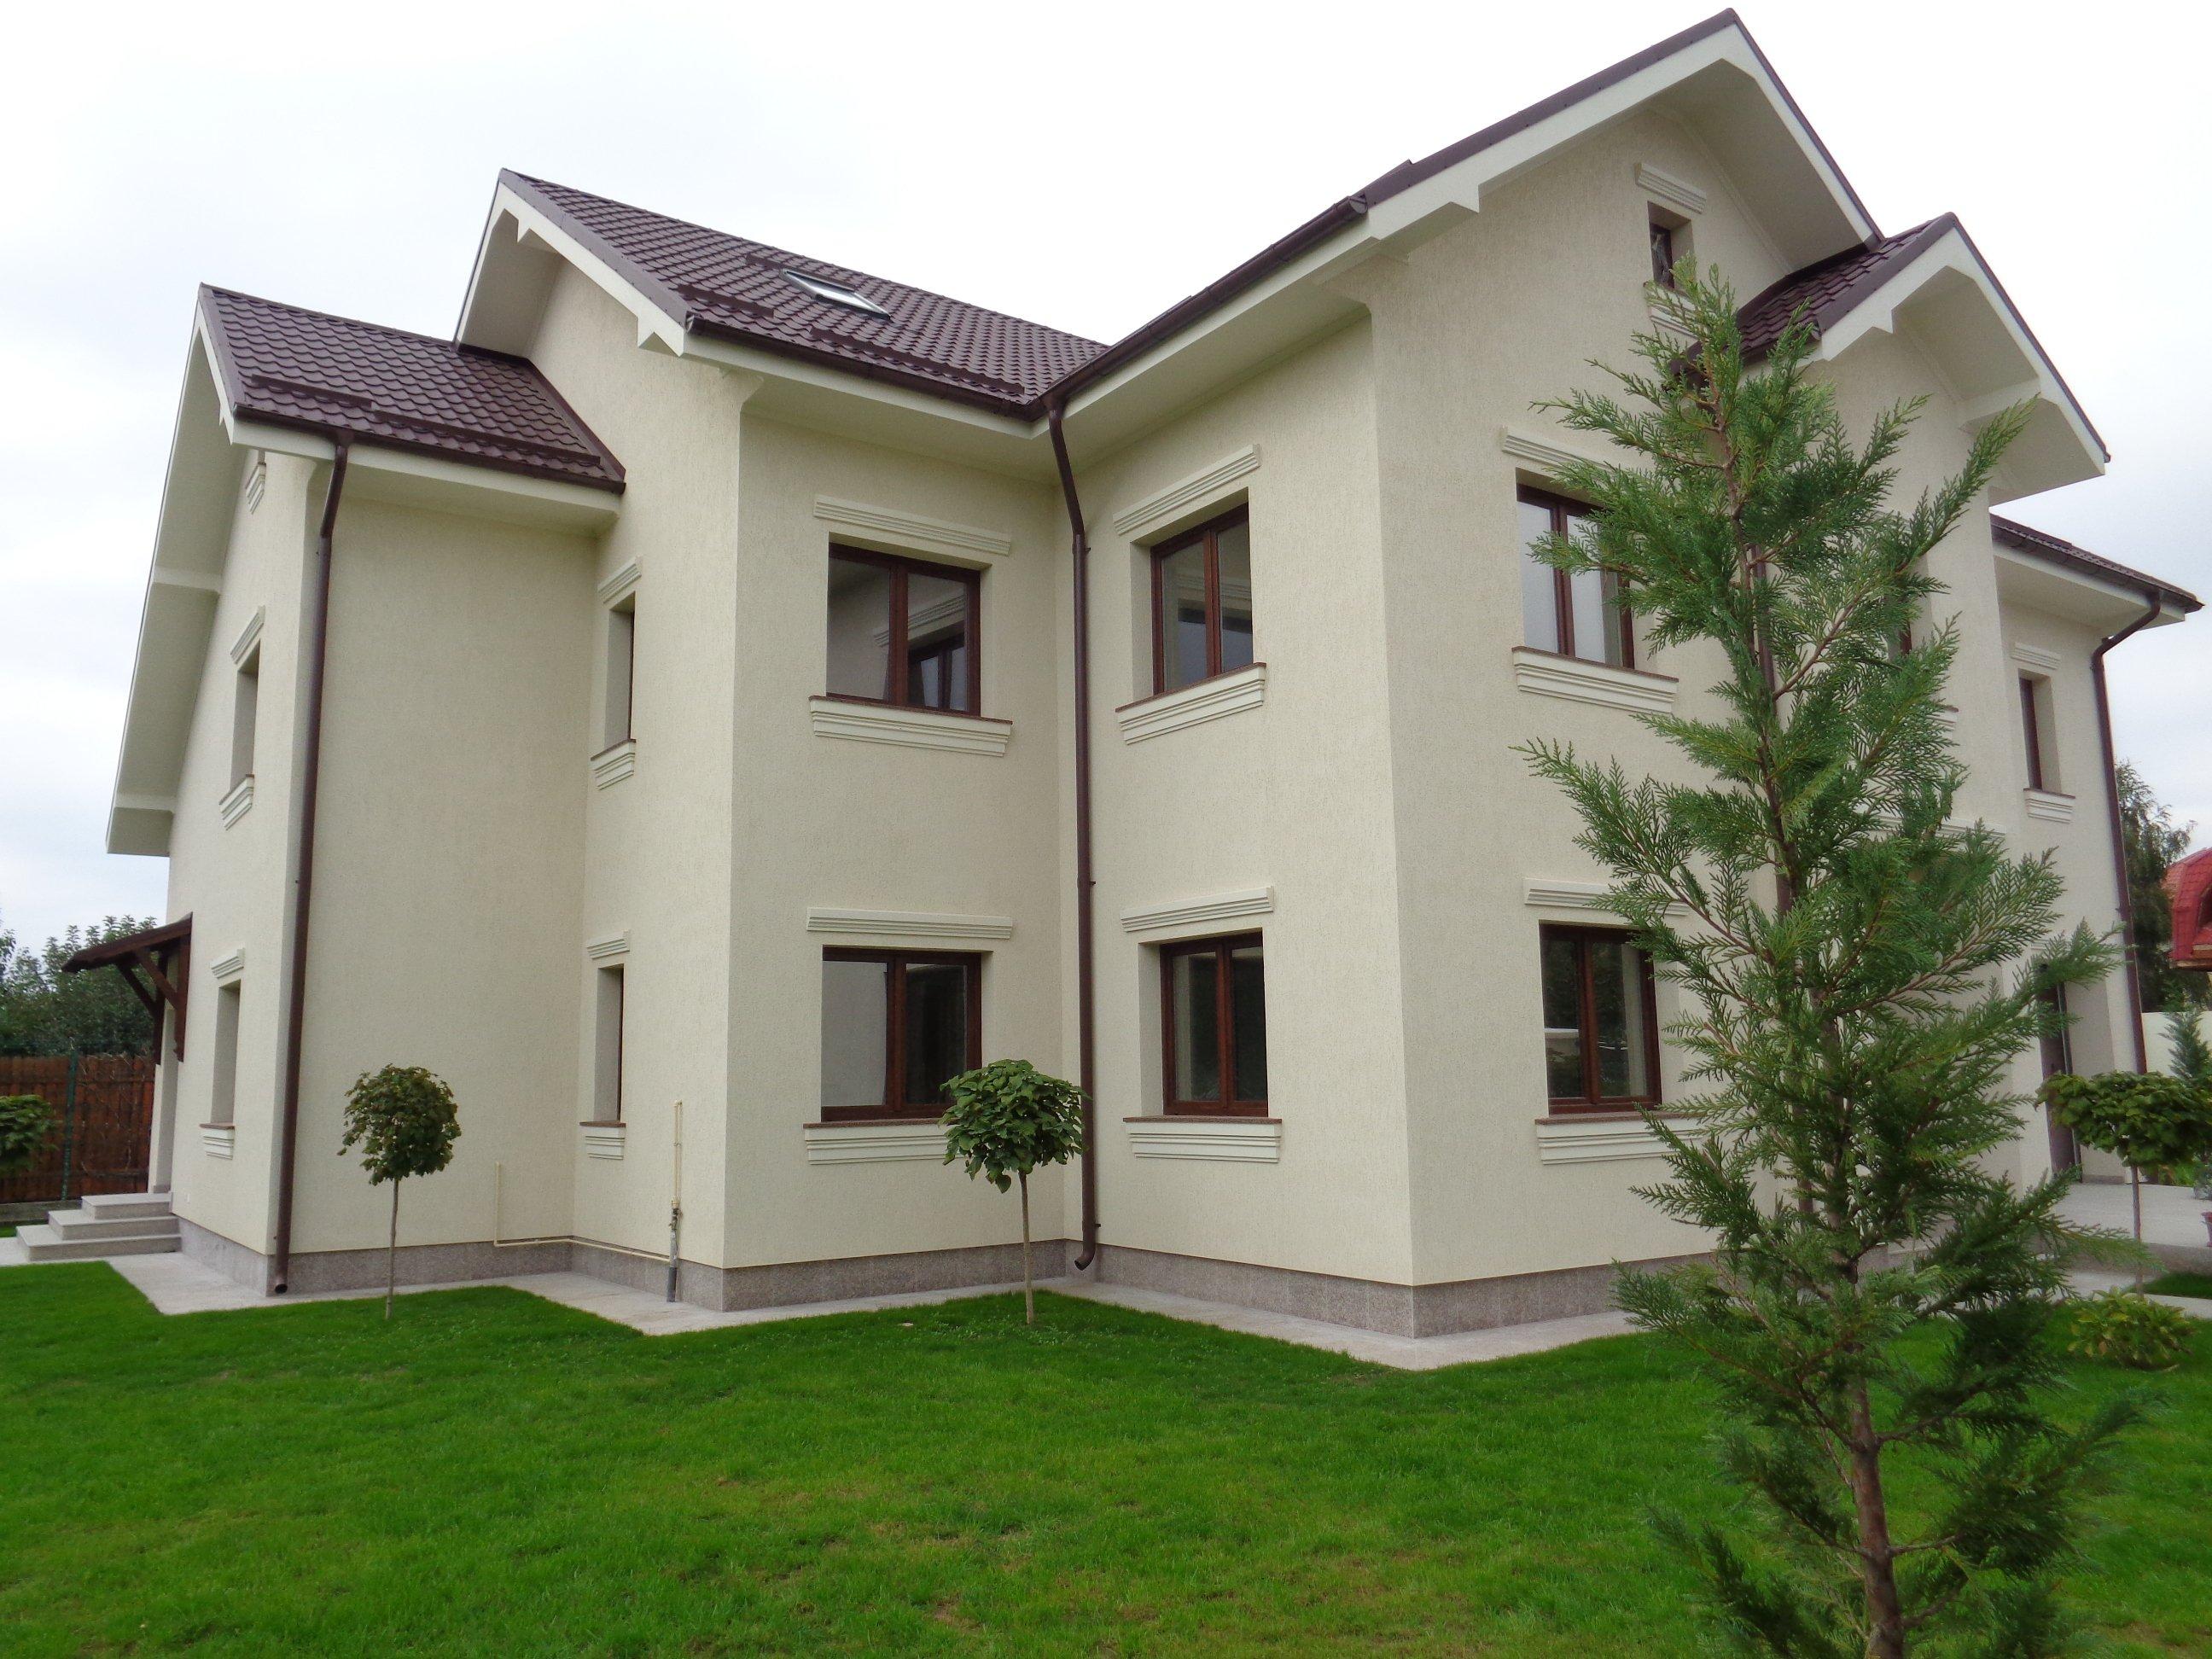 imobiliare-Baneasa-vila-de-vanzare-www.bcsimobiliare.ro